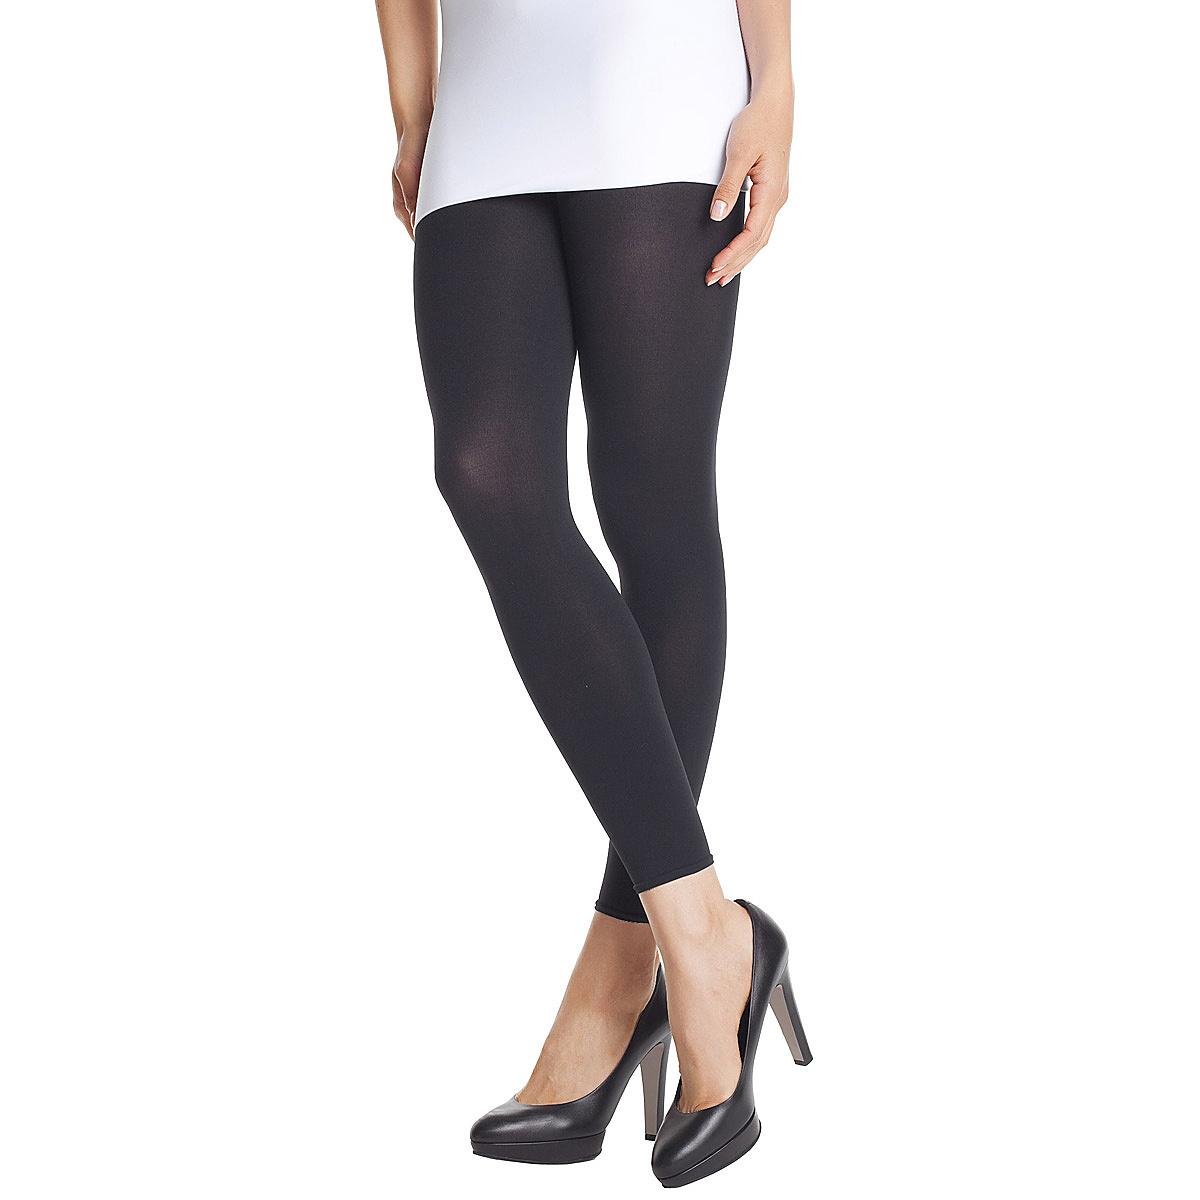 Legging Body Touch Ultra Opaque 80D - DIM - Modalova